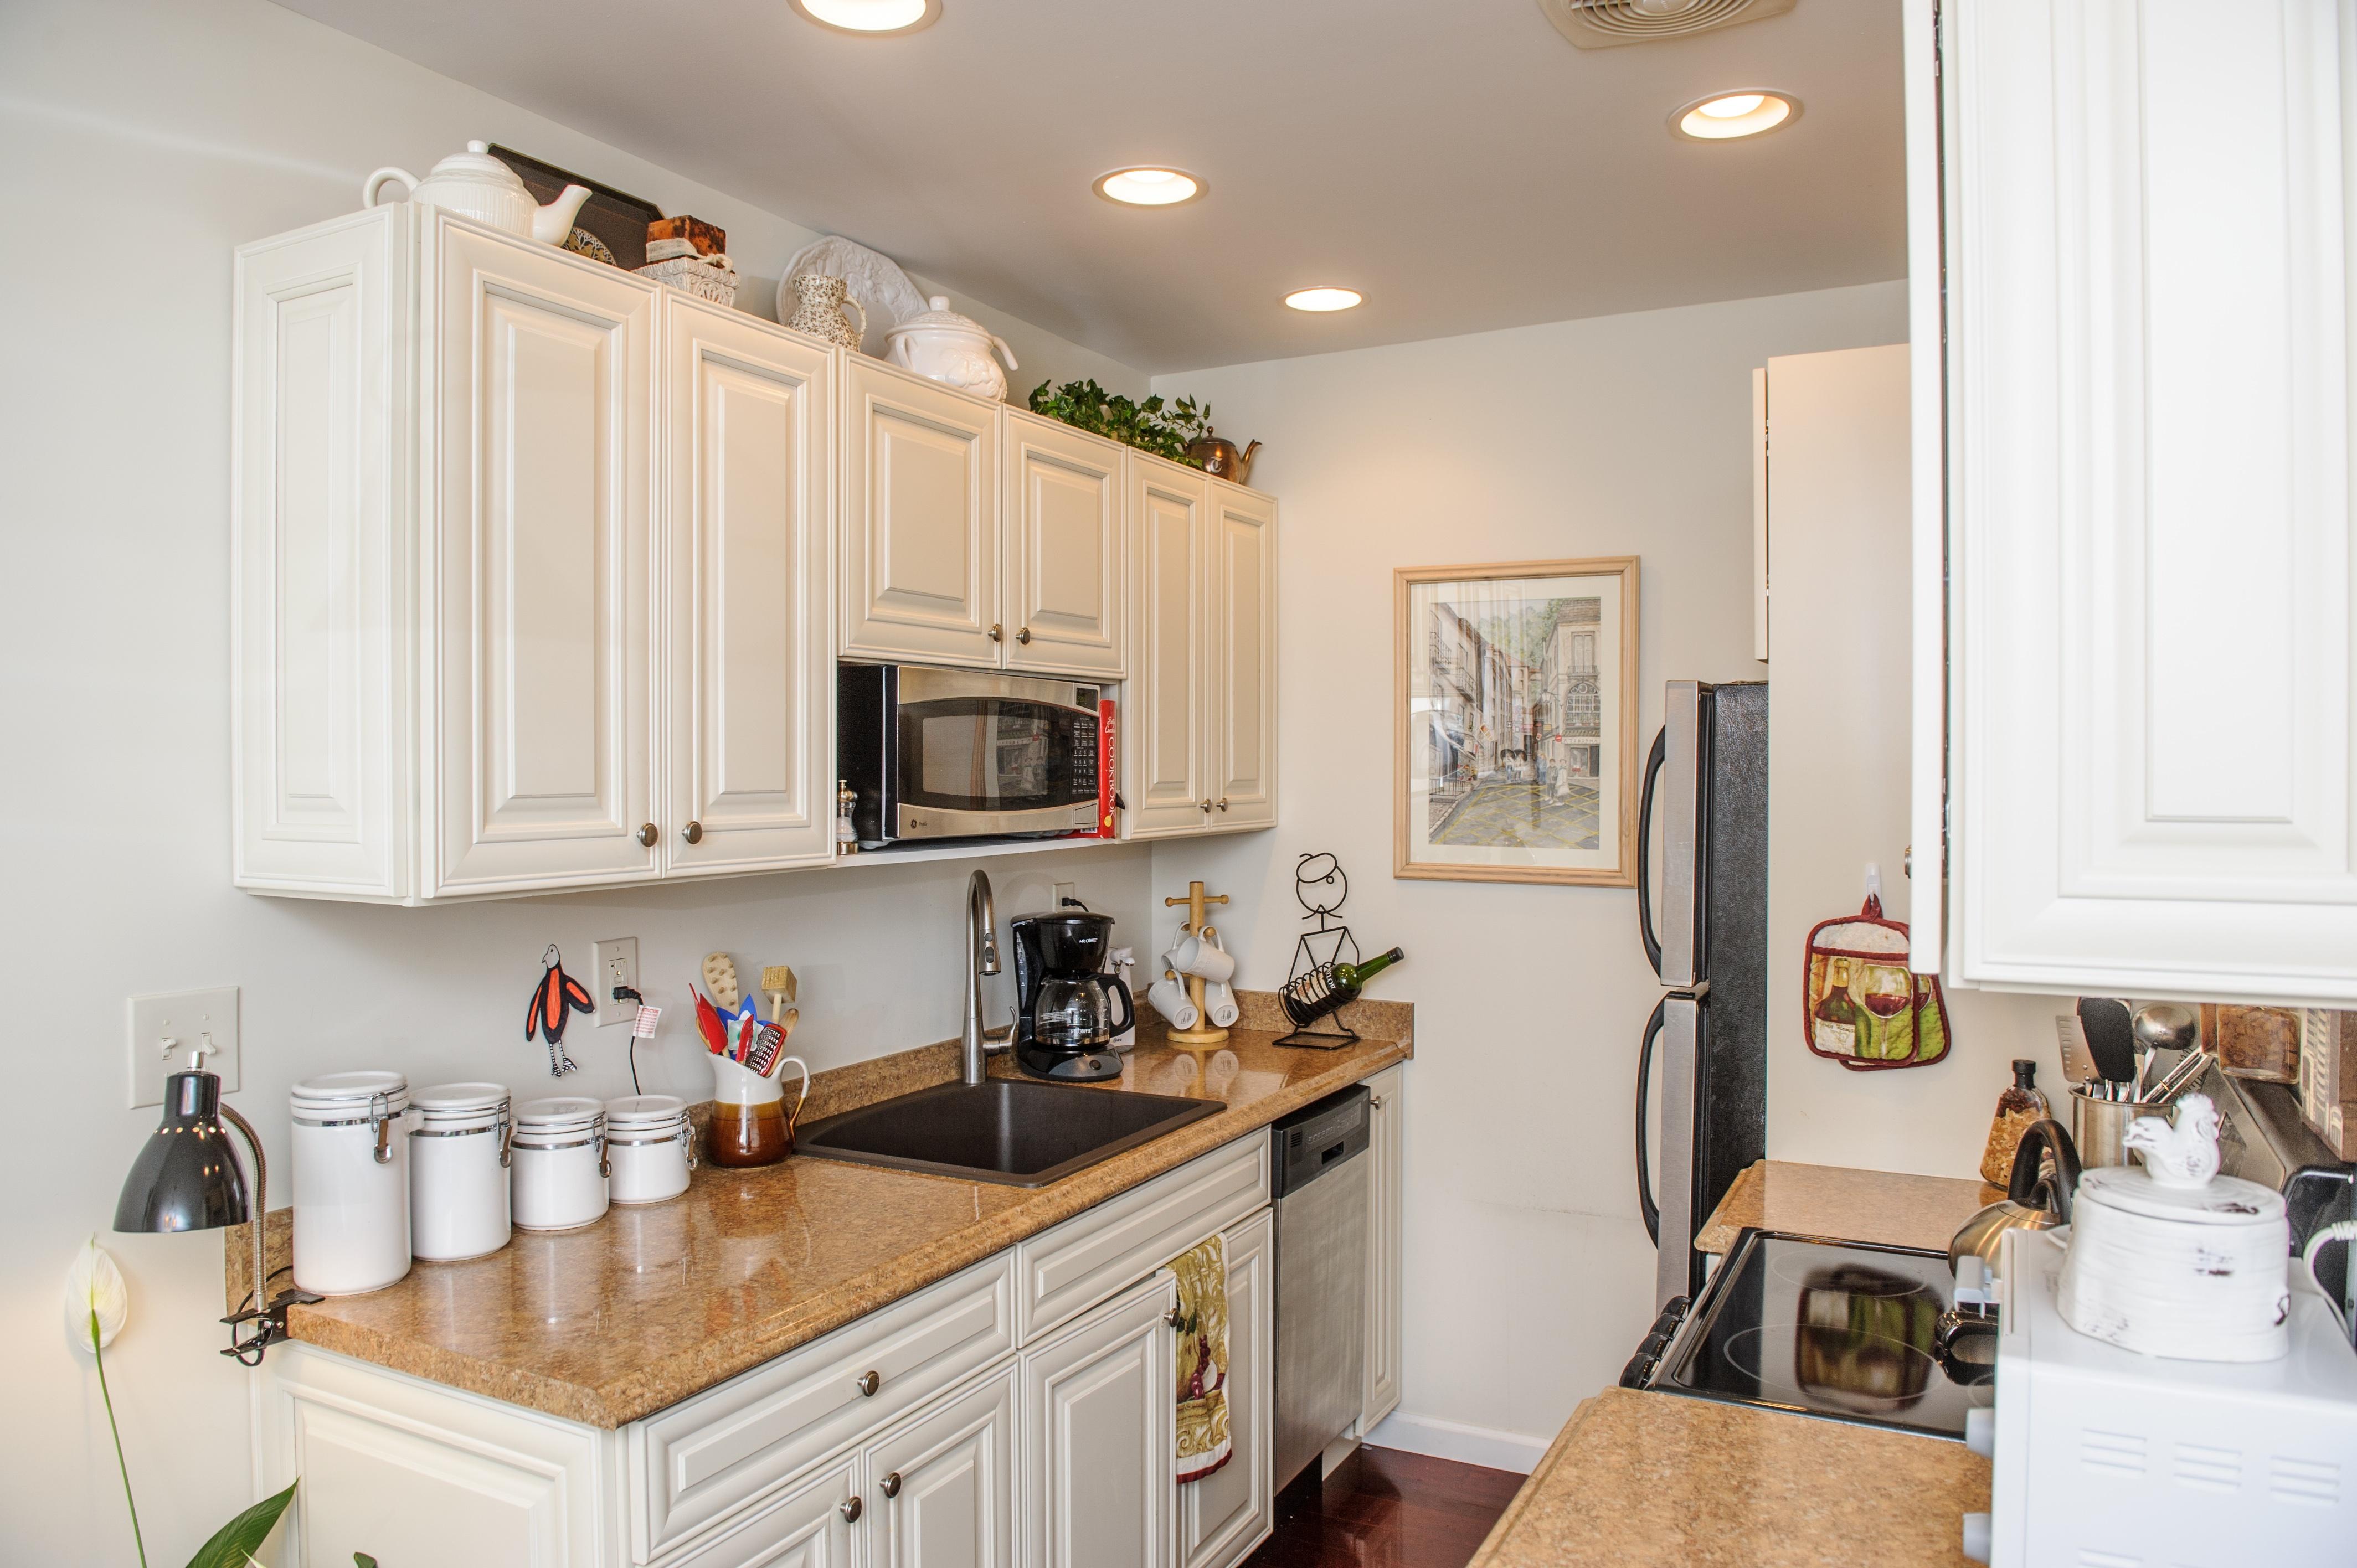 Independent Living Options at Wesley Village